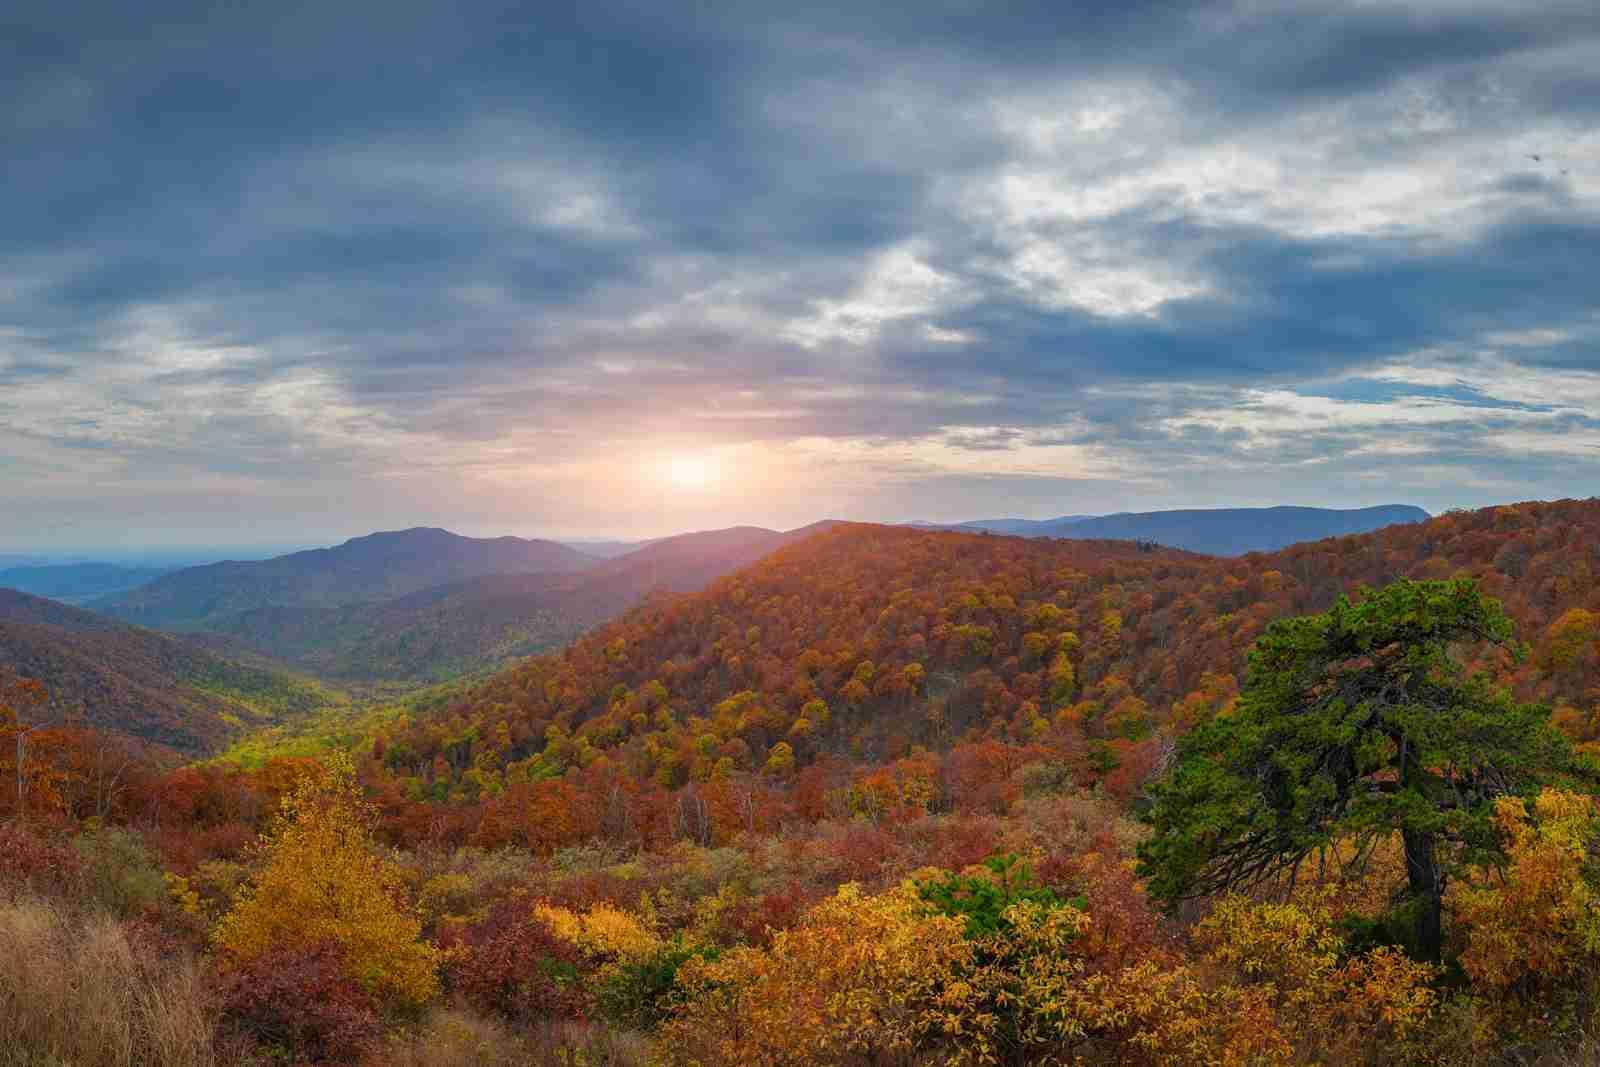 Shenandoah National Park. (Photo by Michael/Adobe Stock)